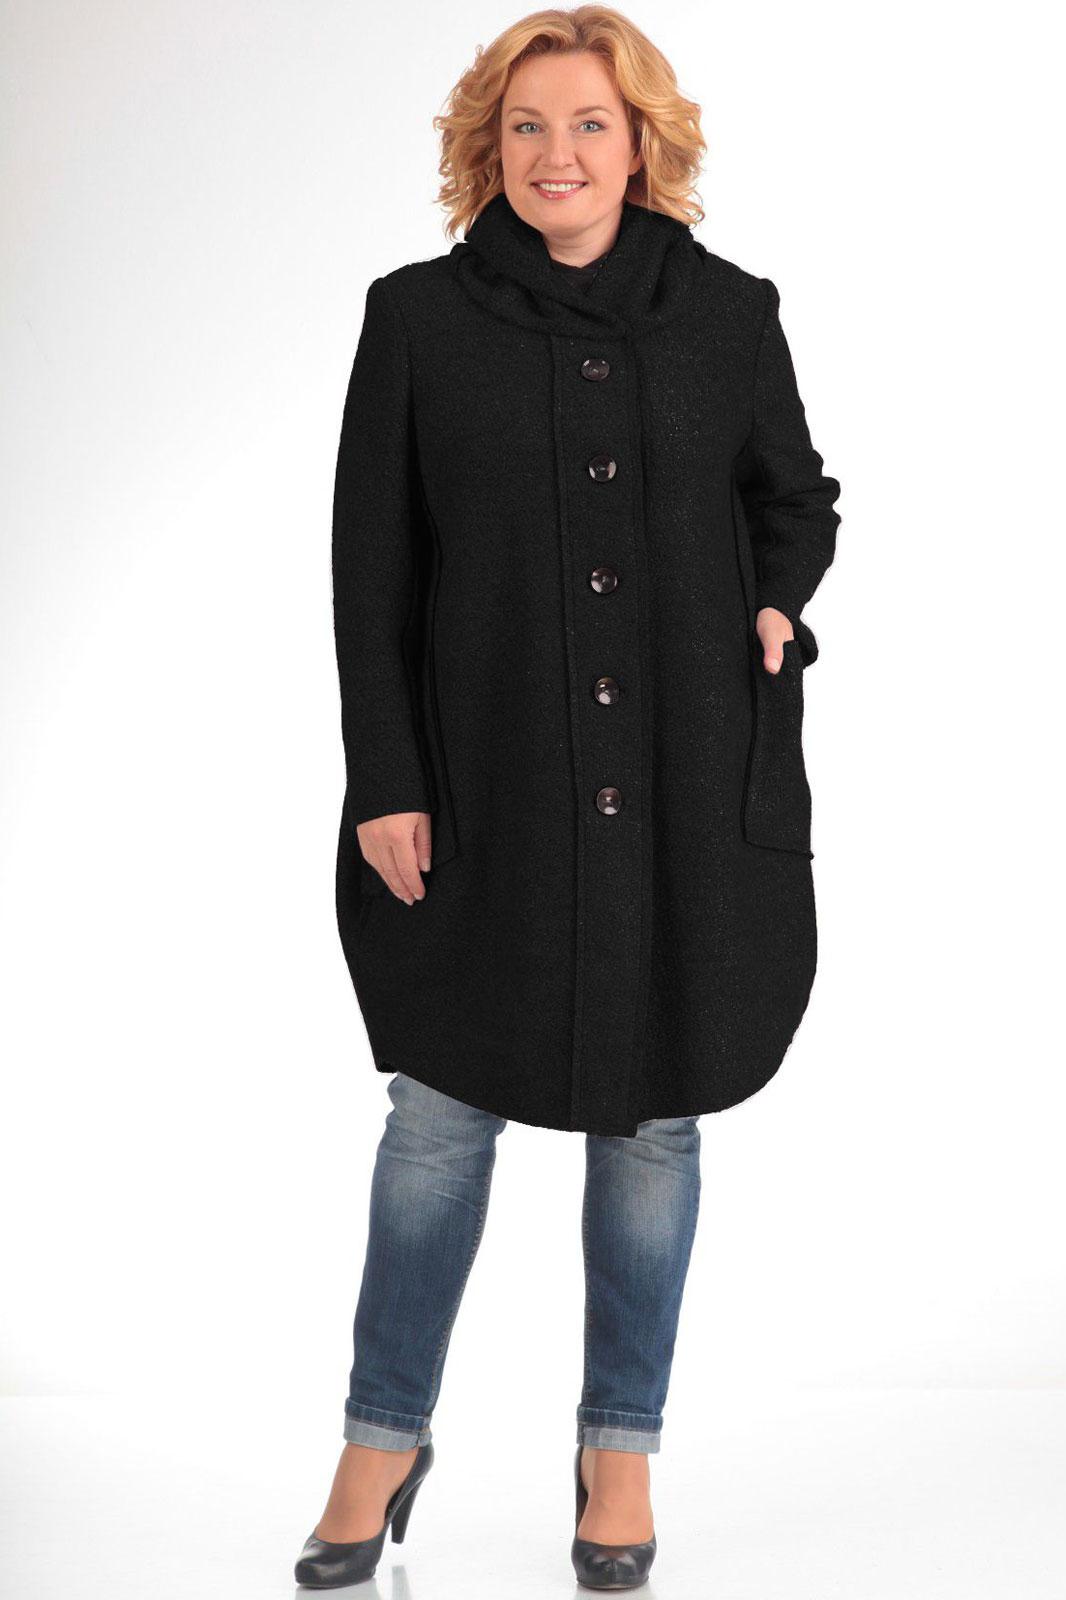 Пальто Pretty 485-2 черный - фото 1